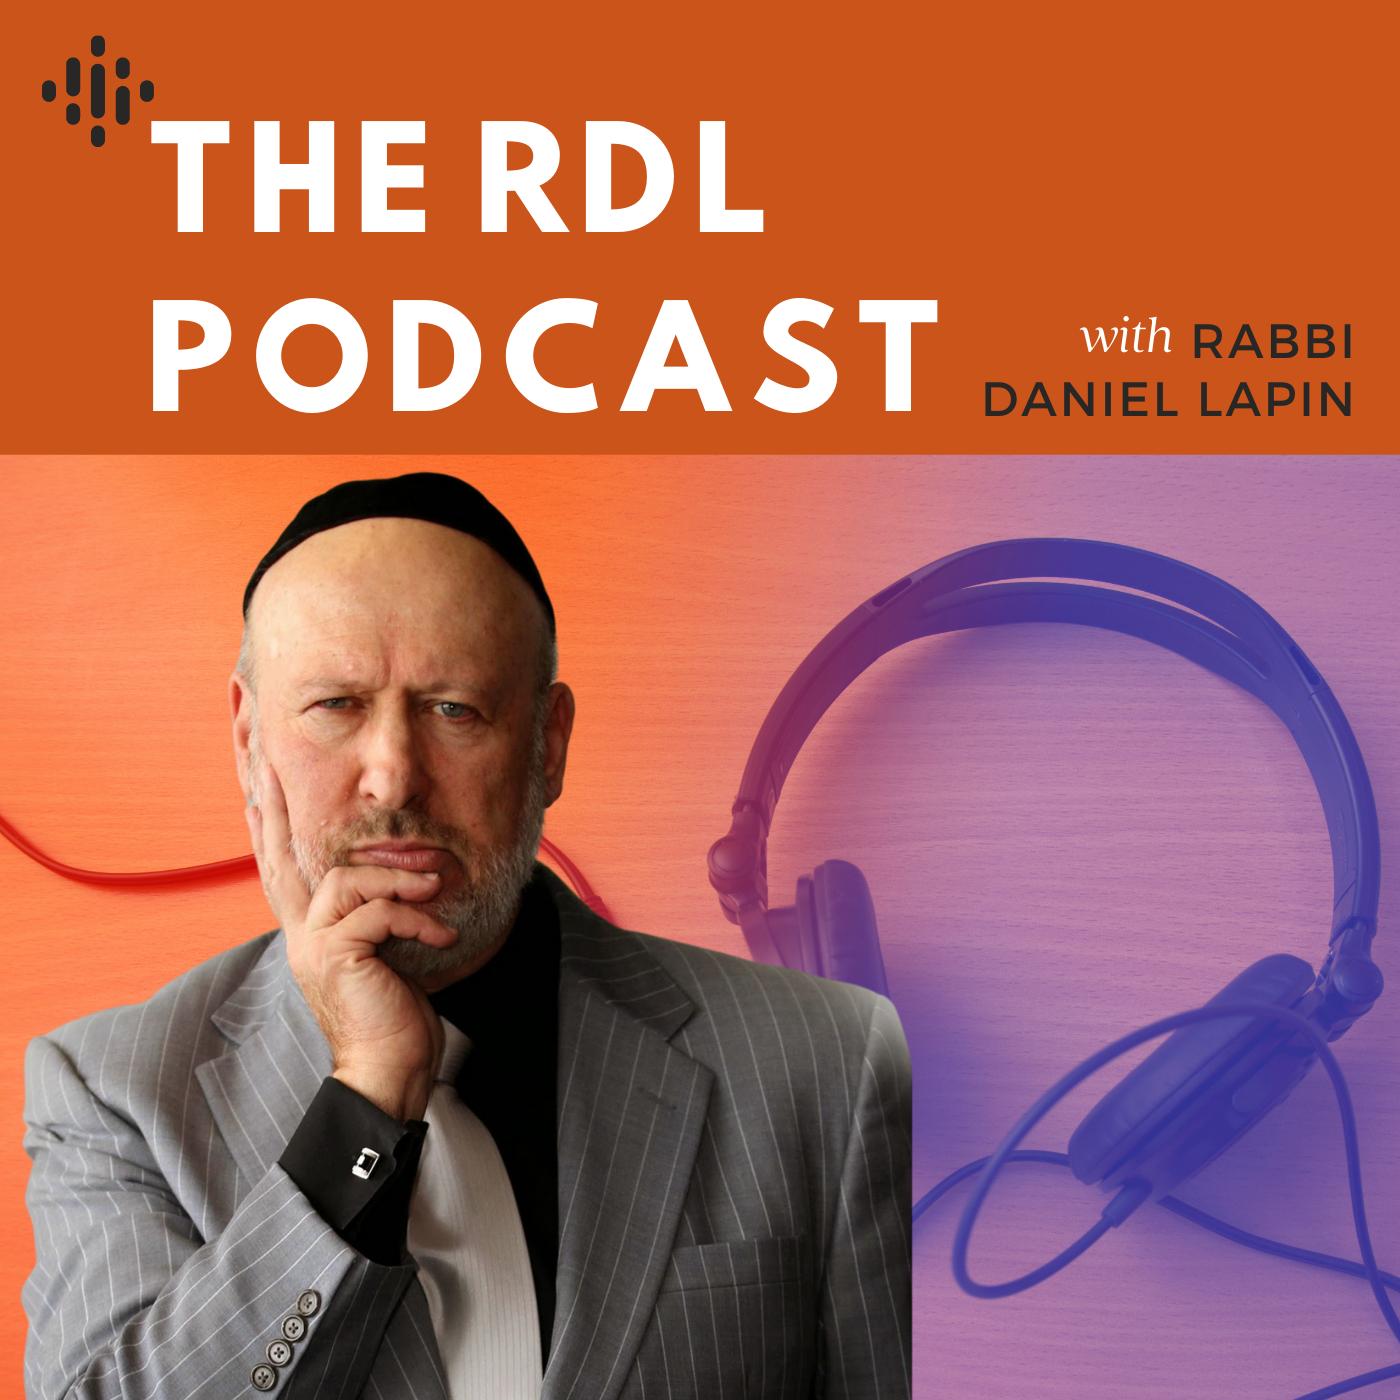 Rabbi Daniel Lapin's podcast show art